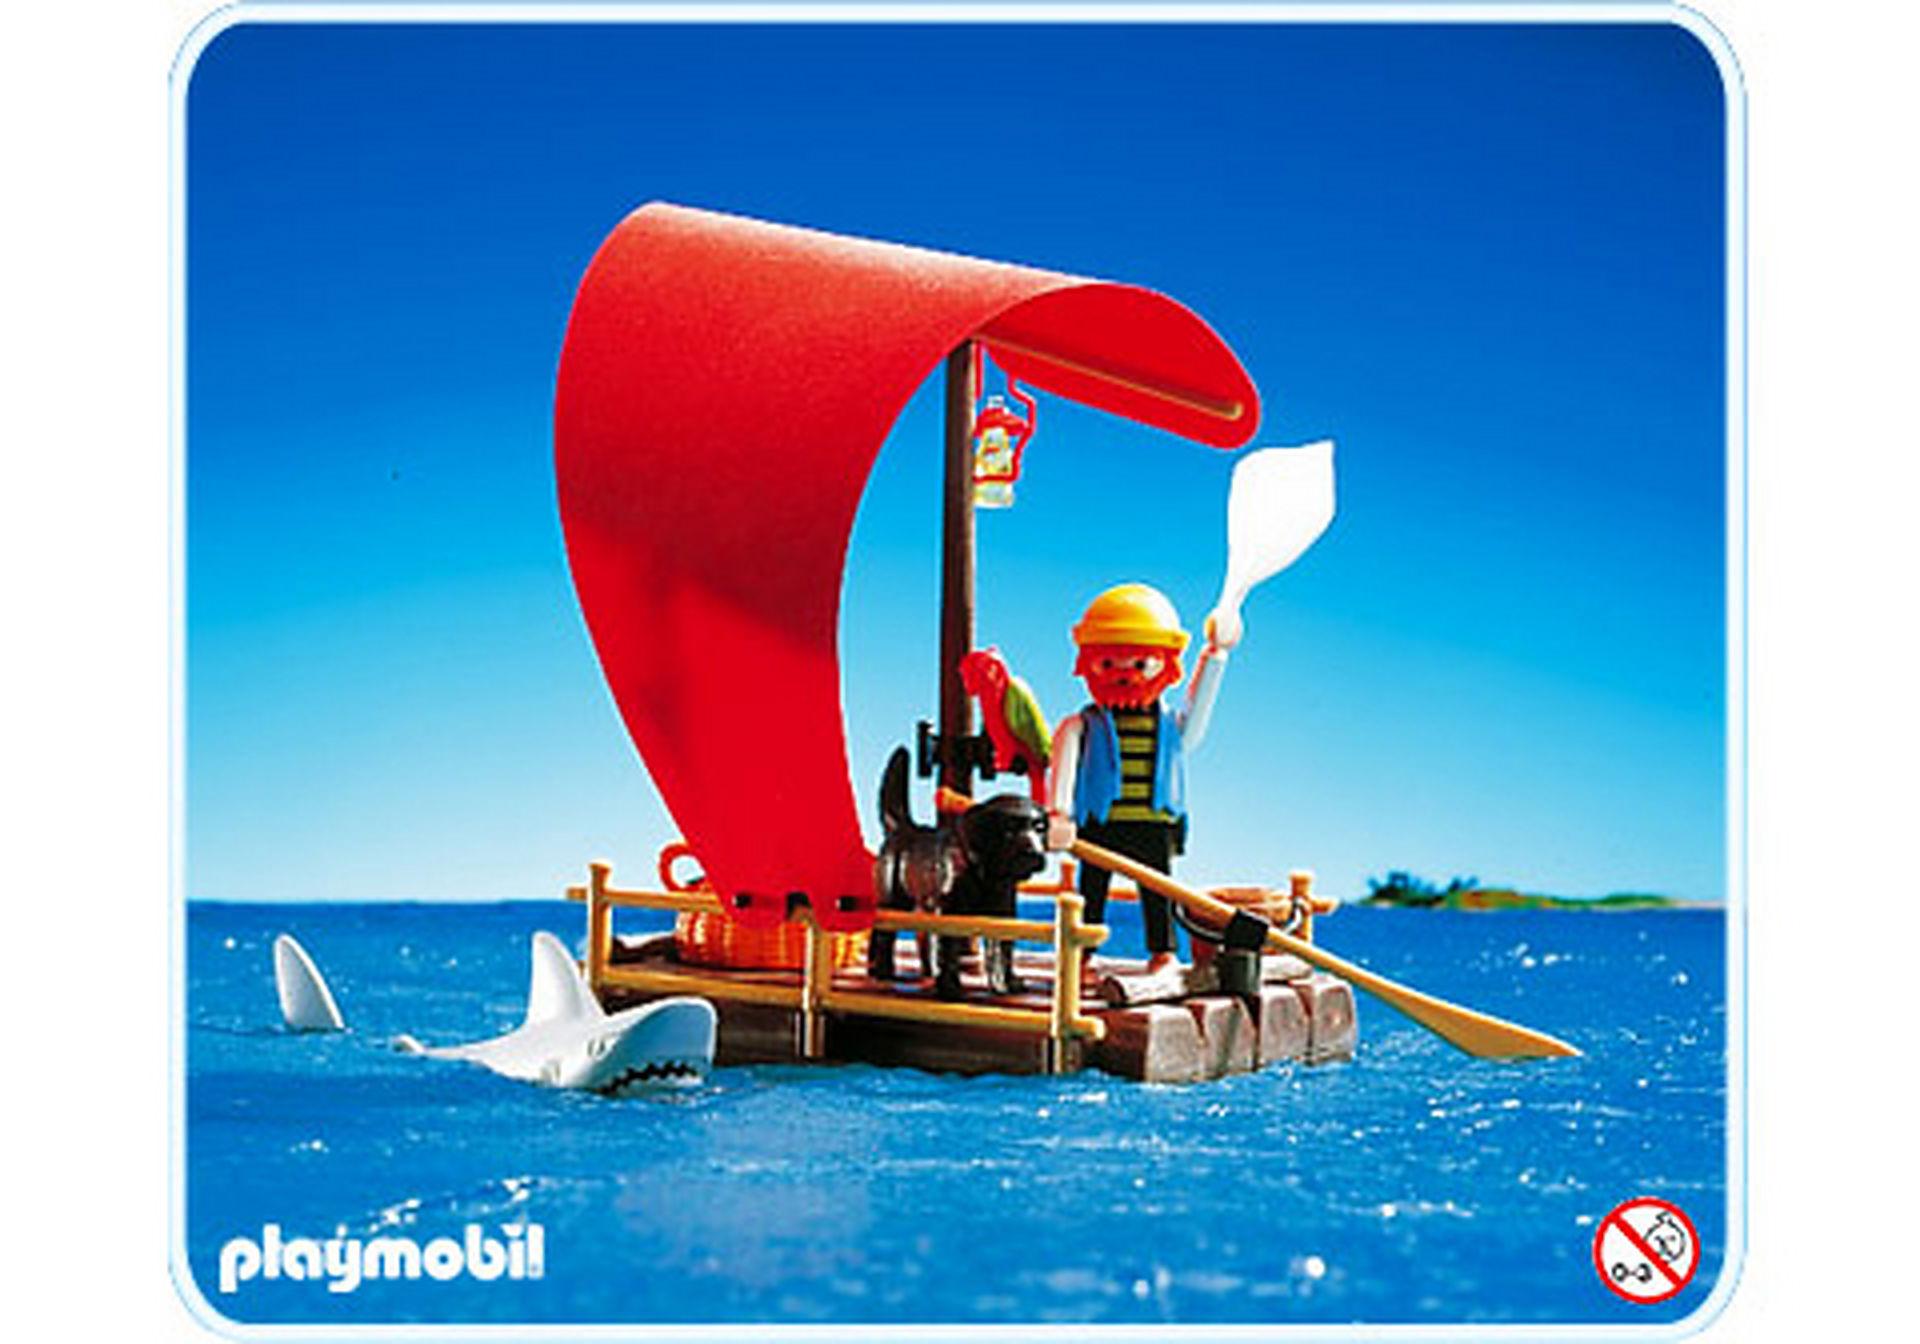 http://media.playmobil.com/i/playmobil/3736-A_product_detail/Pirat/Floß/Hai